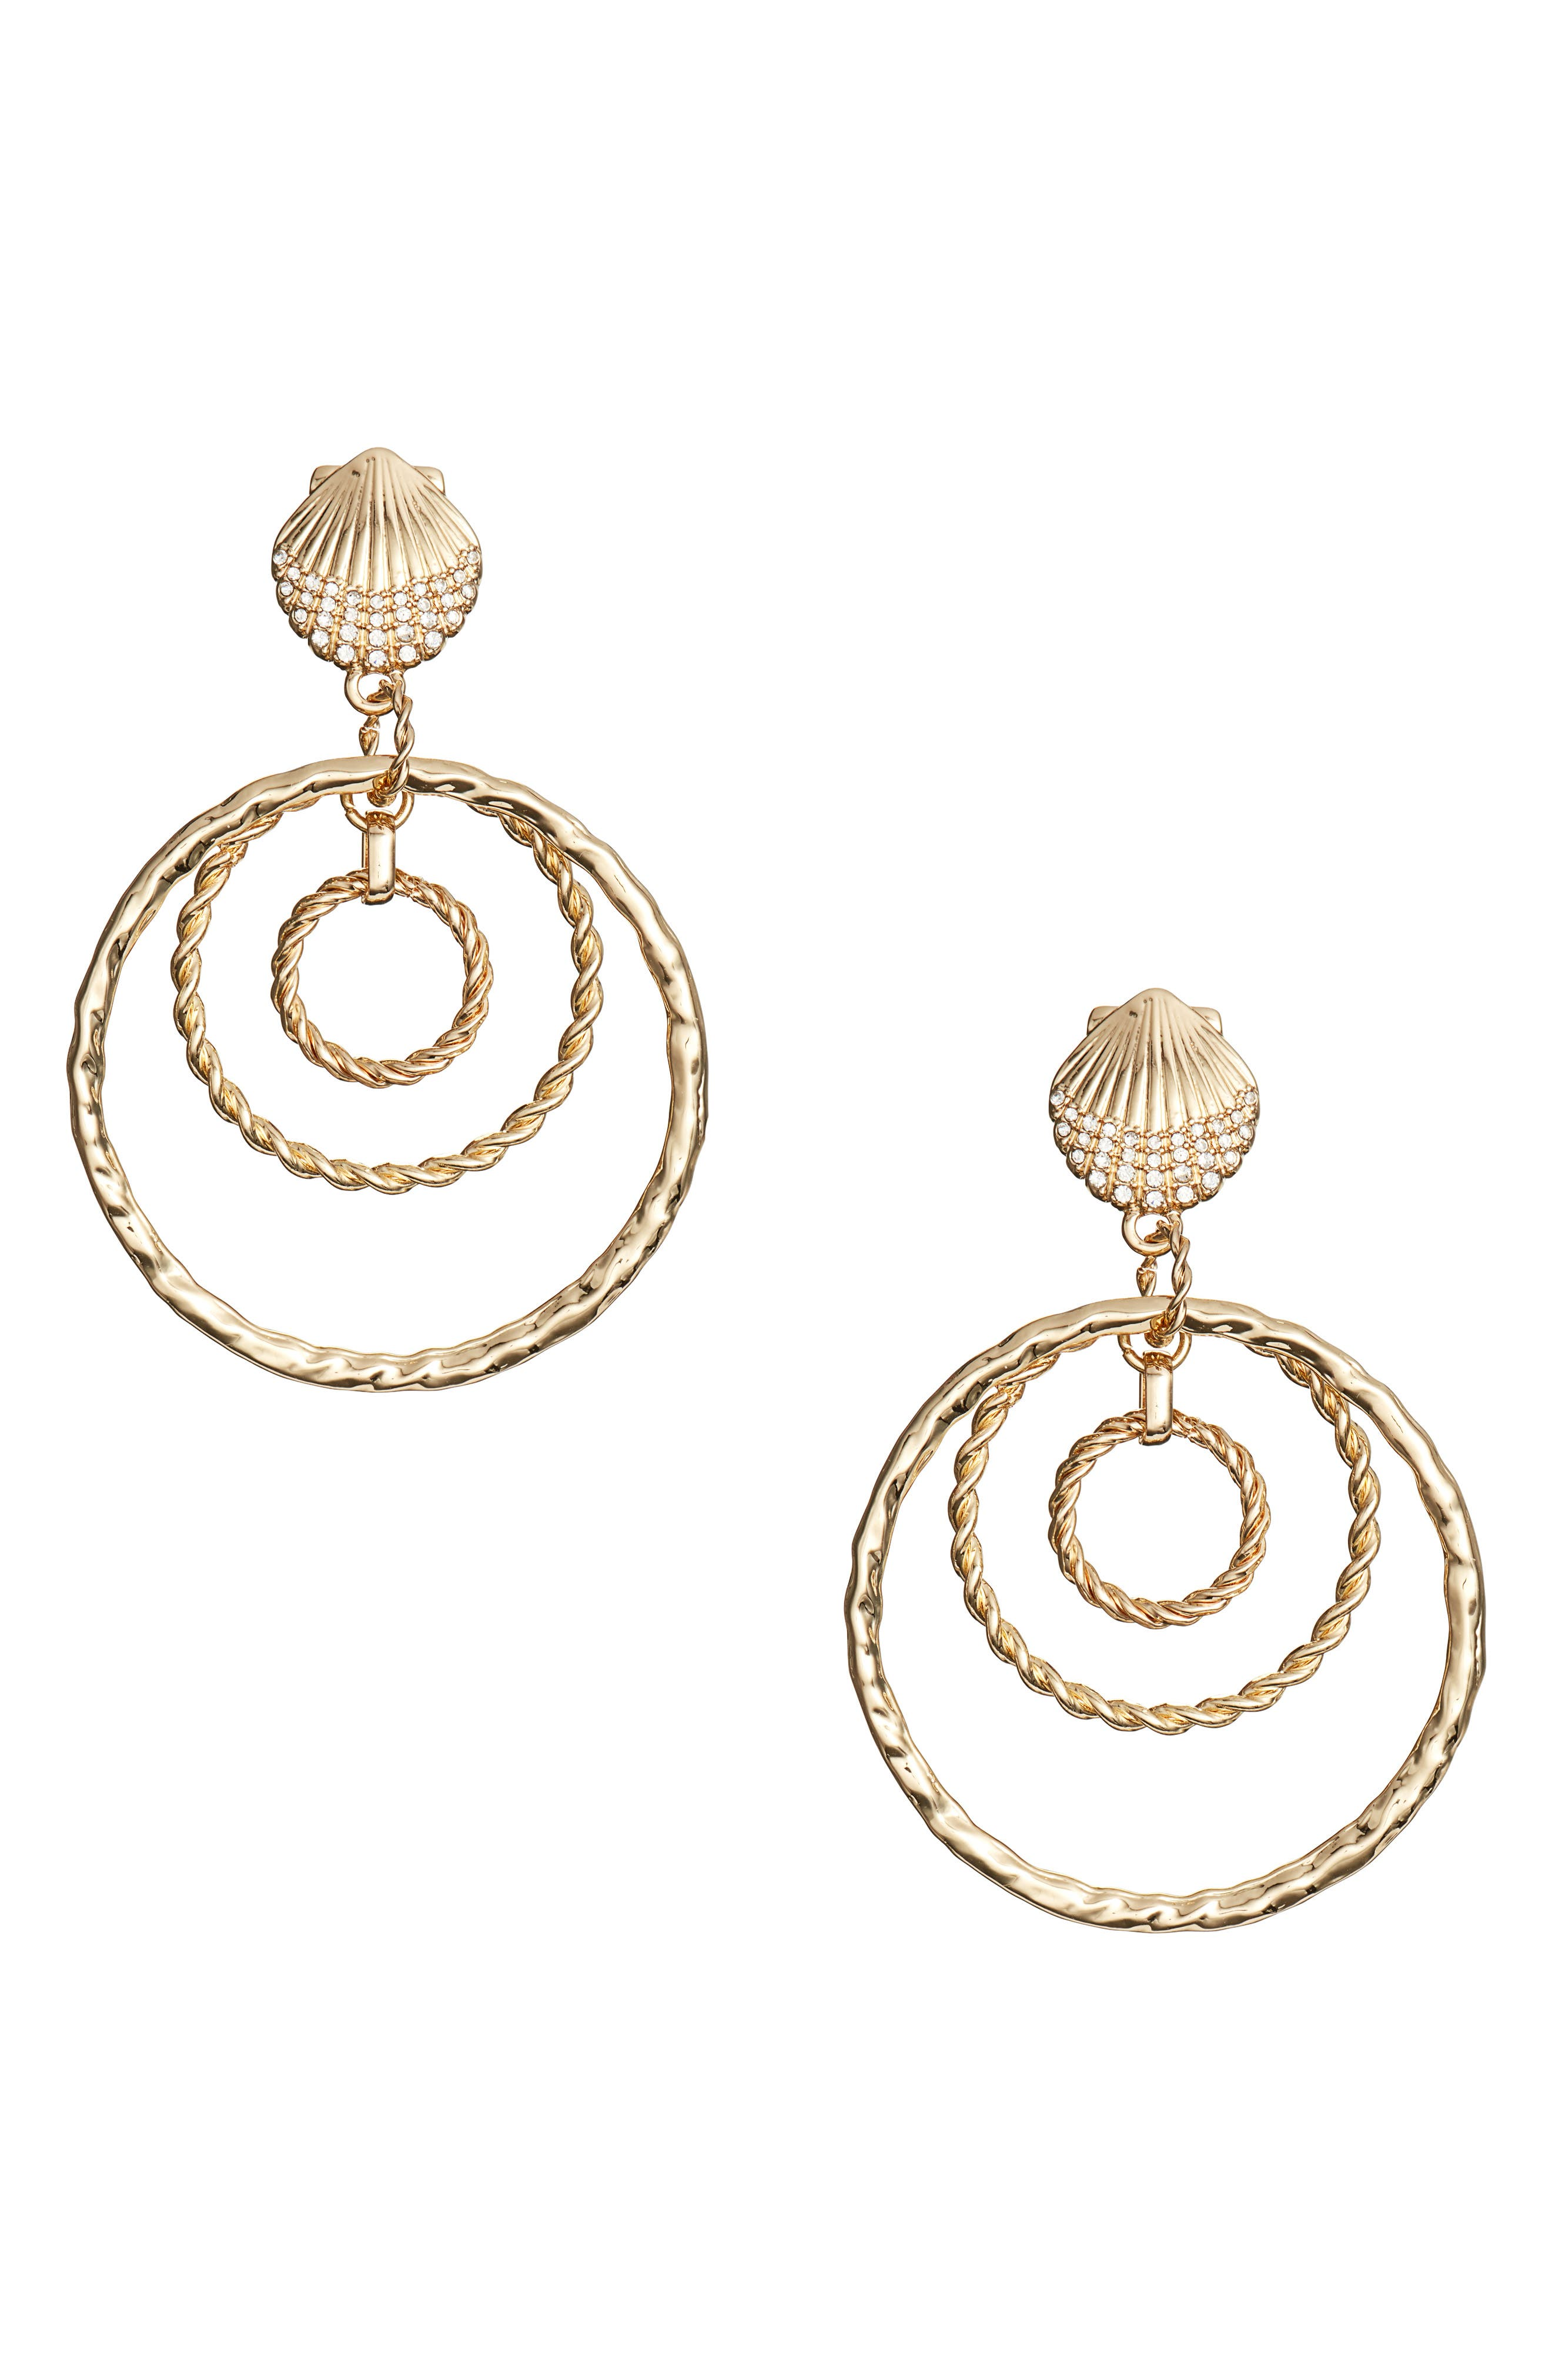 Celestial Seas Hoop Earrings,                         Main,                         color, GOLD METALLIC